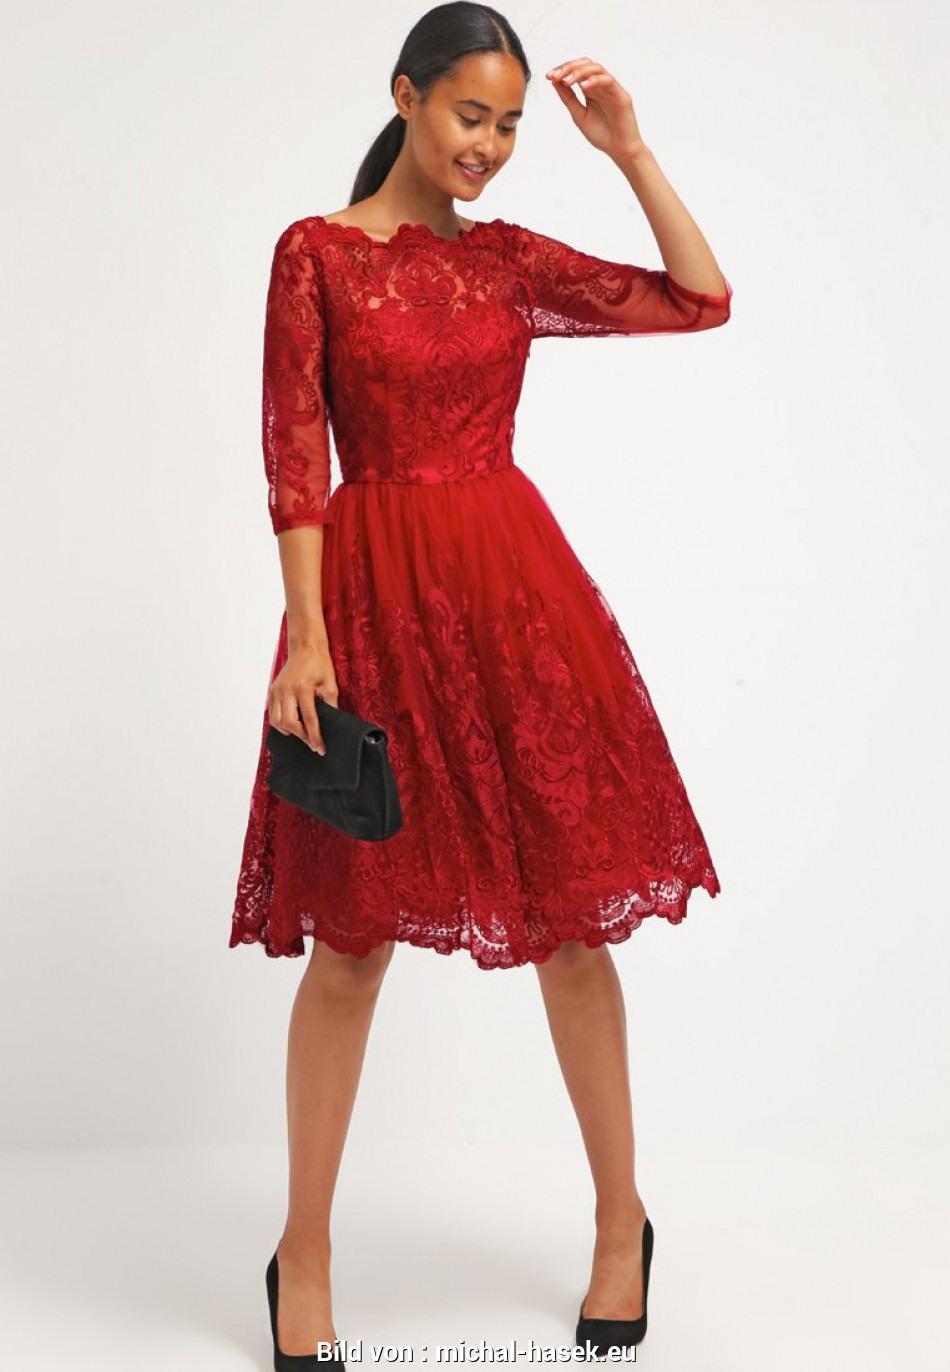 13 Großartig Zalando Abendkleid Kurz BoutiqueFormal Genial Zalando Abendkleid Kurz Spezialgebiet